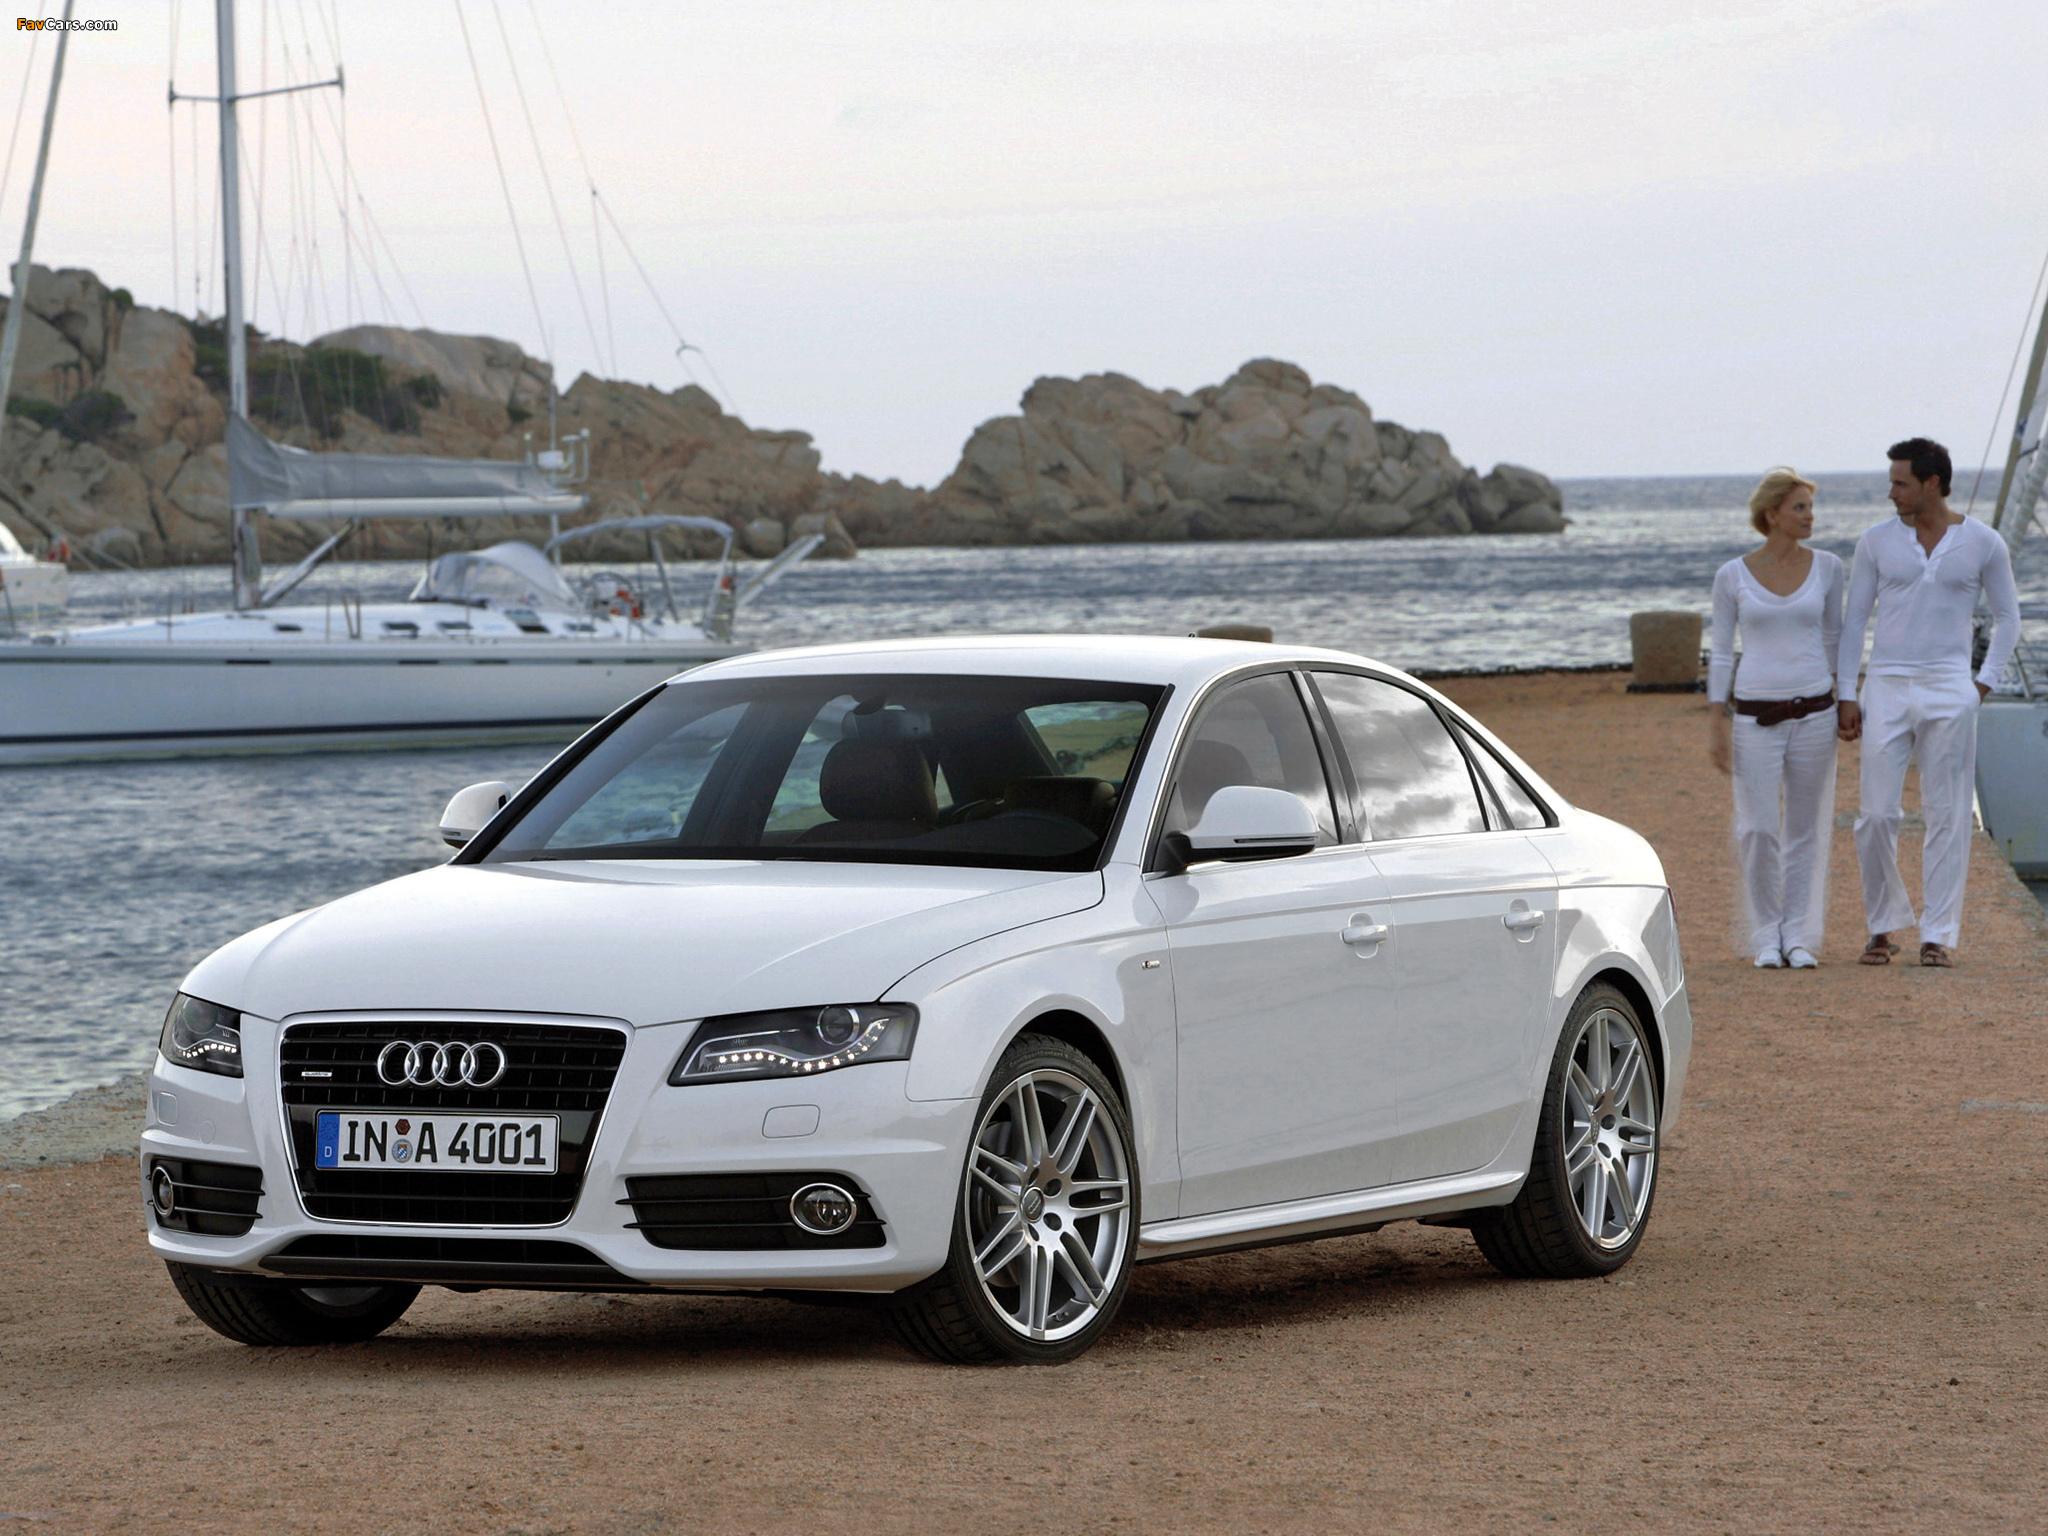 Kelebihan Audi A4 3.2 Fsi Harga